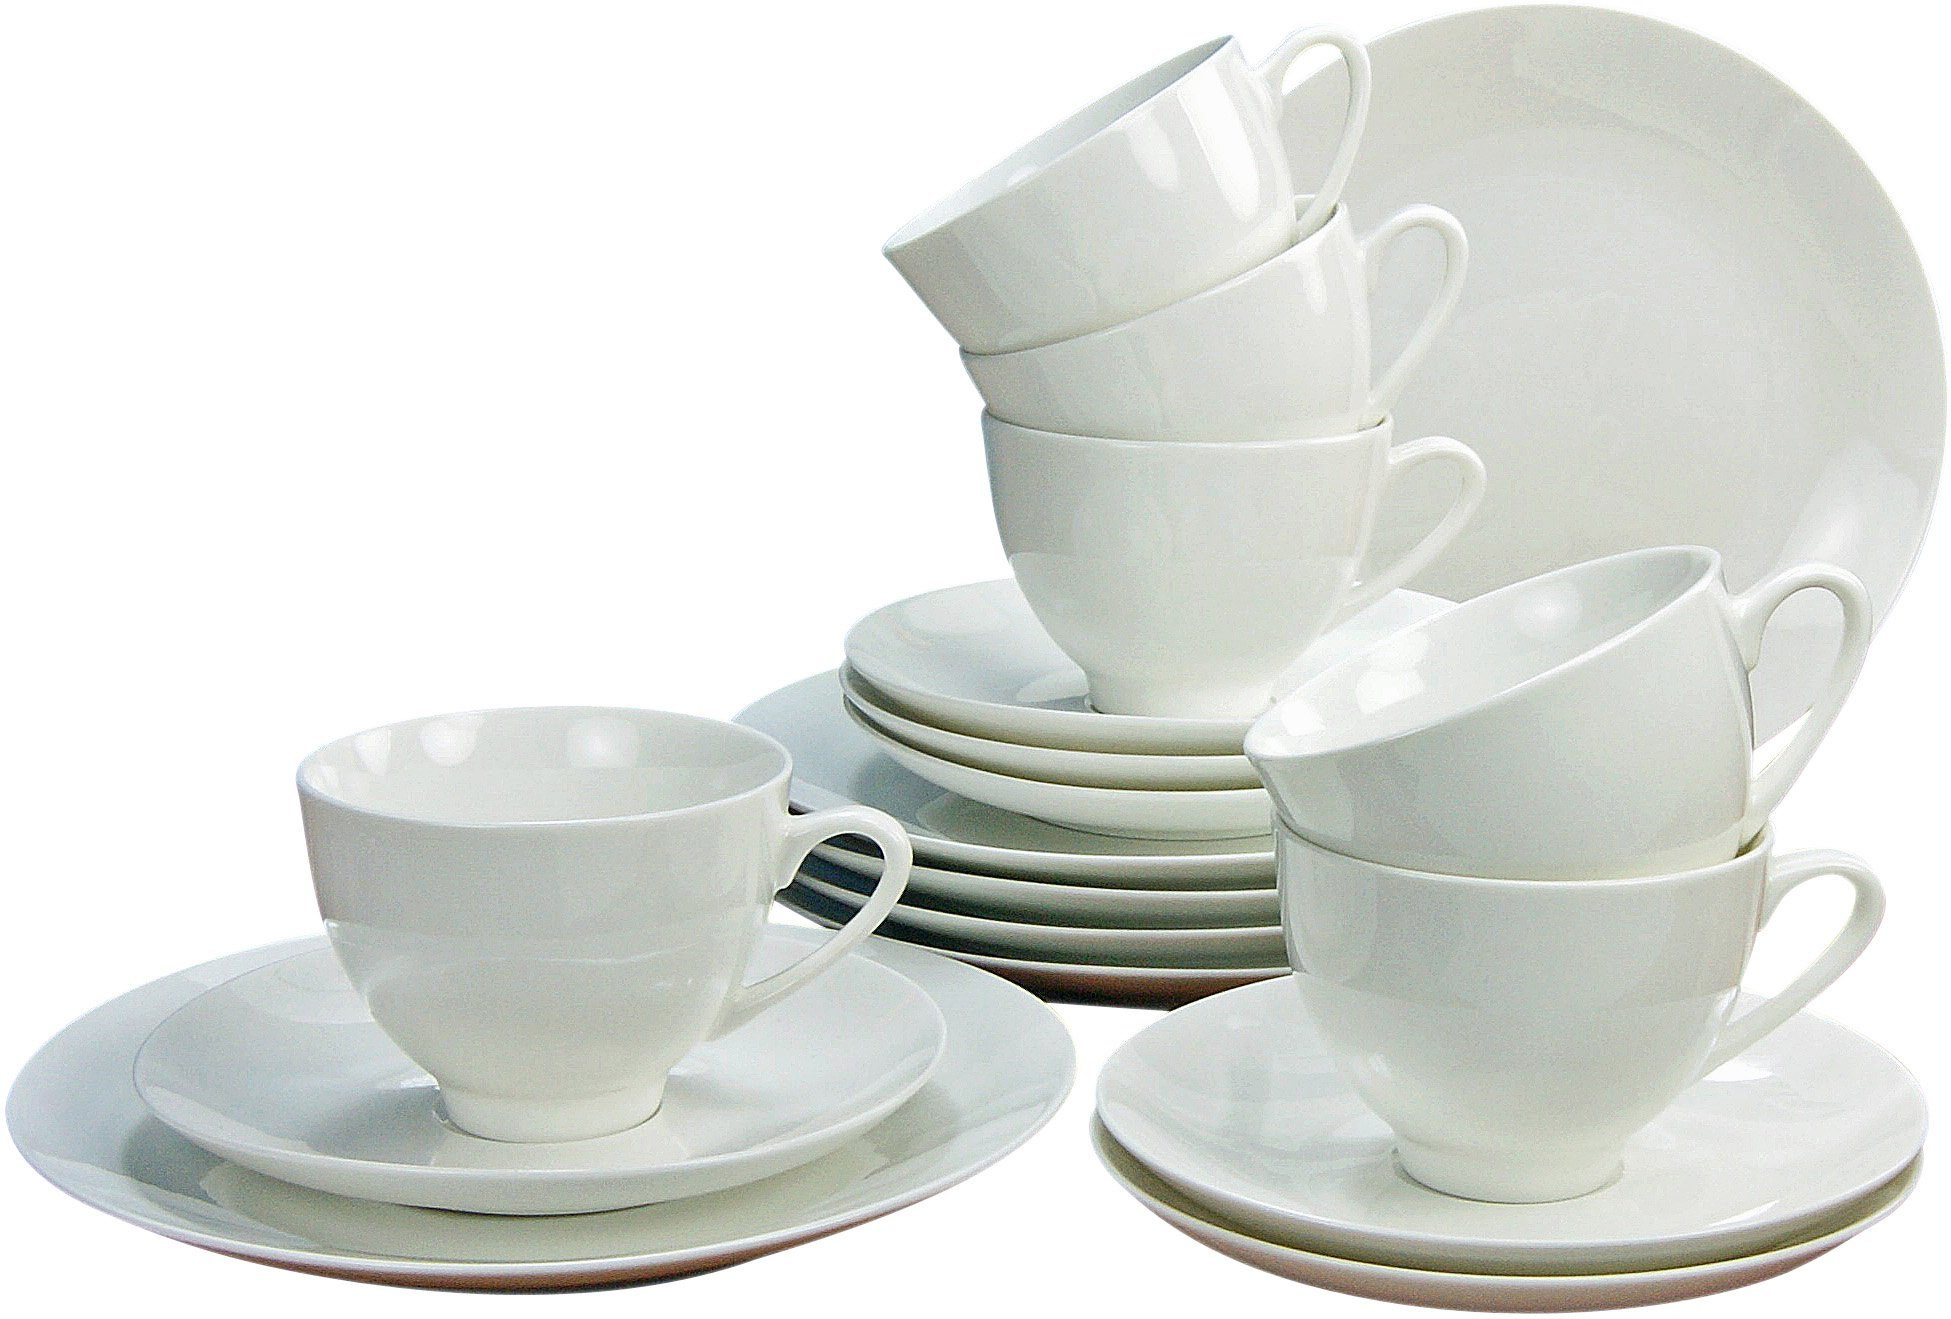 CreaTable Kaffeeservice Bone China Porzellan, 18 Teile, »CAPRICE«